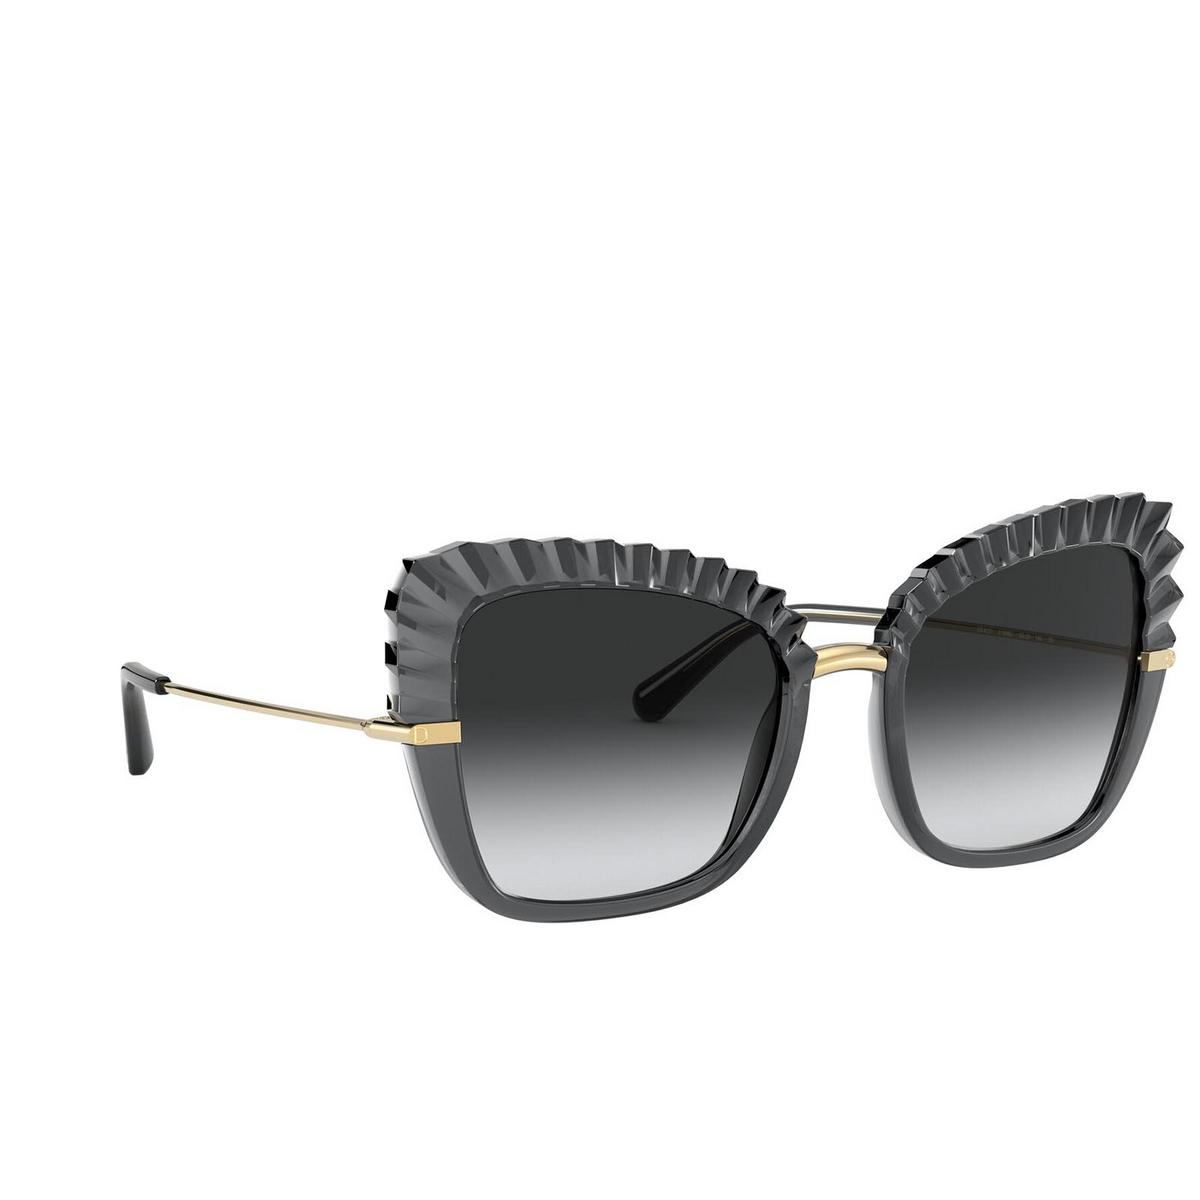 Dolce & Gabbana® Butterfly Sunglasses: DG6131 color Transparent Grey 31608G - three-quarters view.